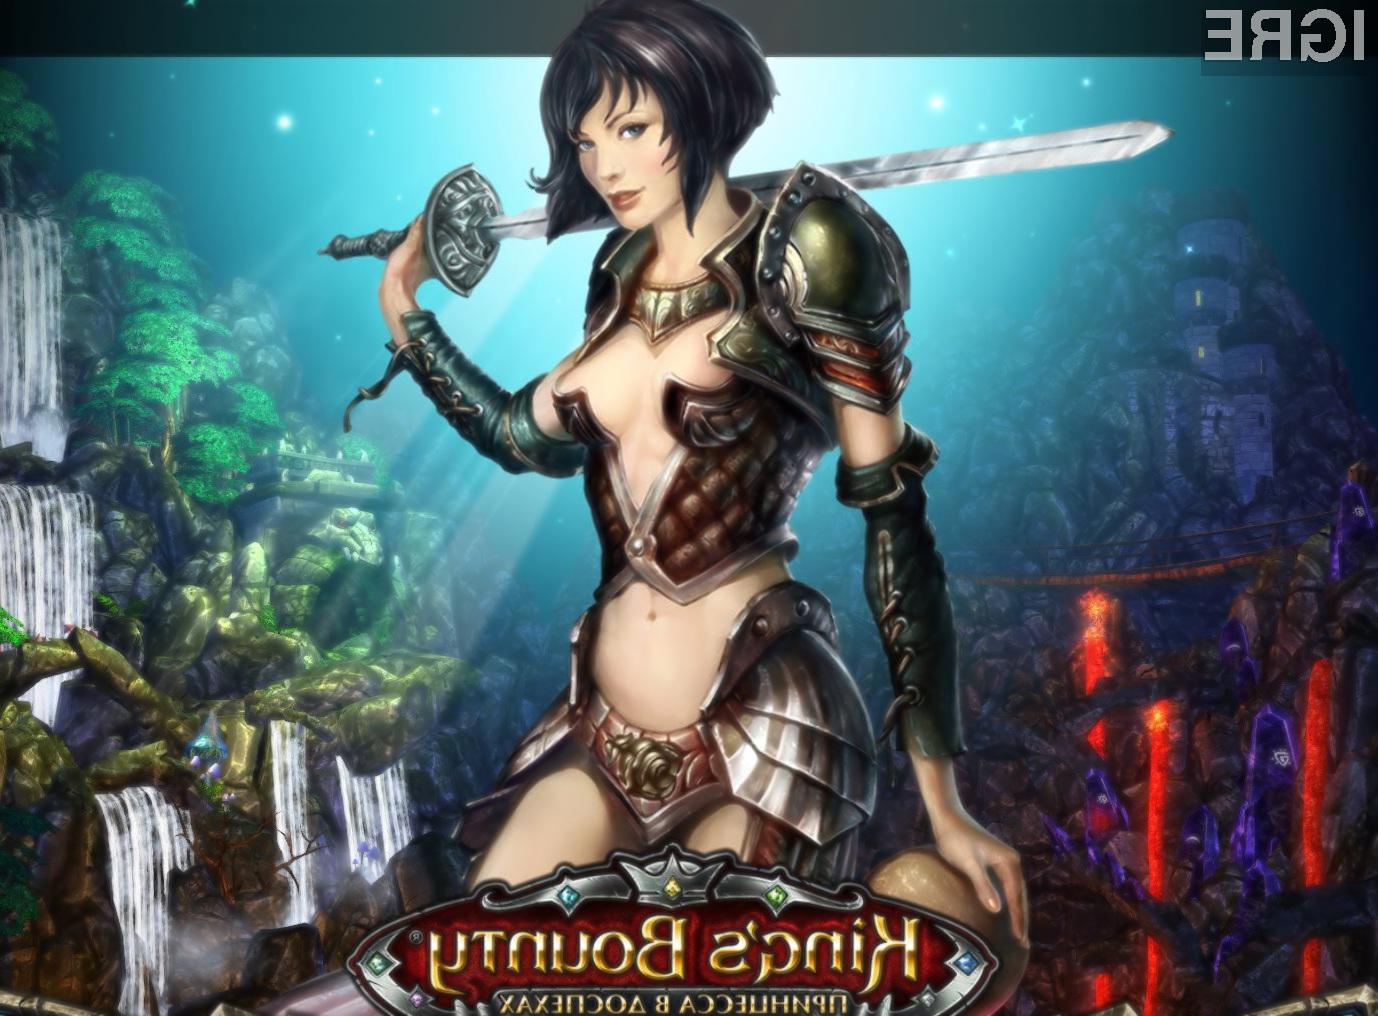 V dodatku bomo postavljeni v vlogo lepe princese Amelie.